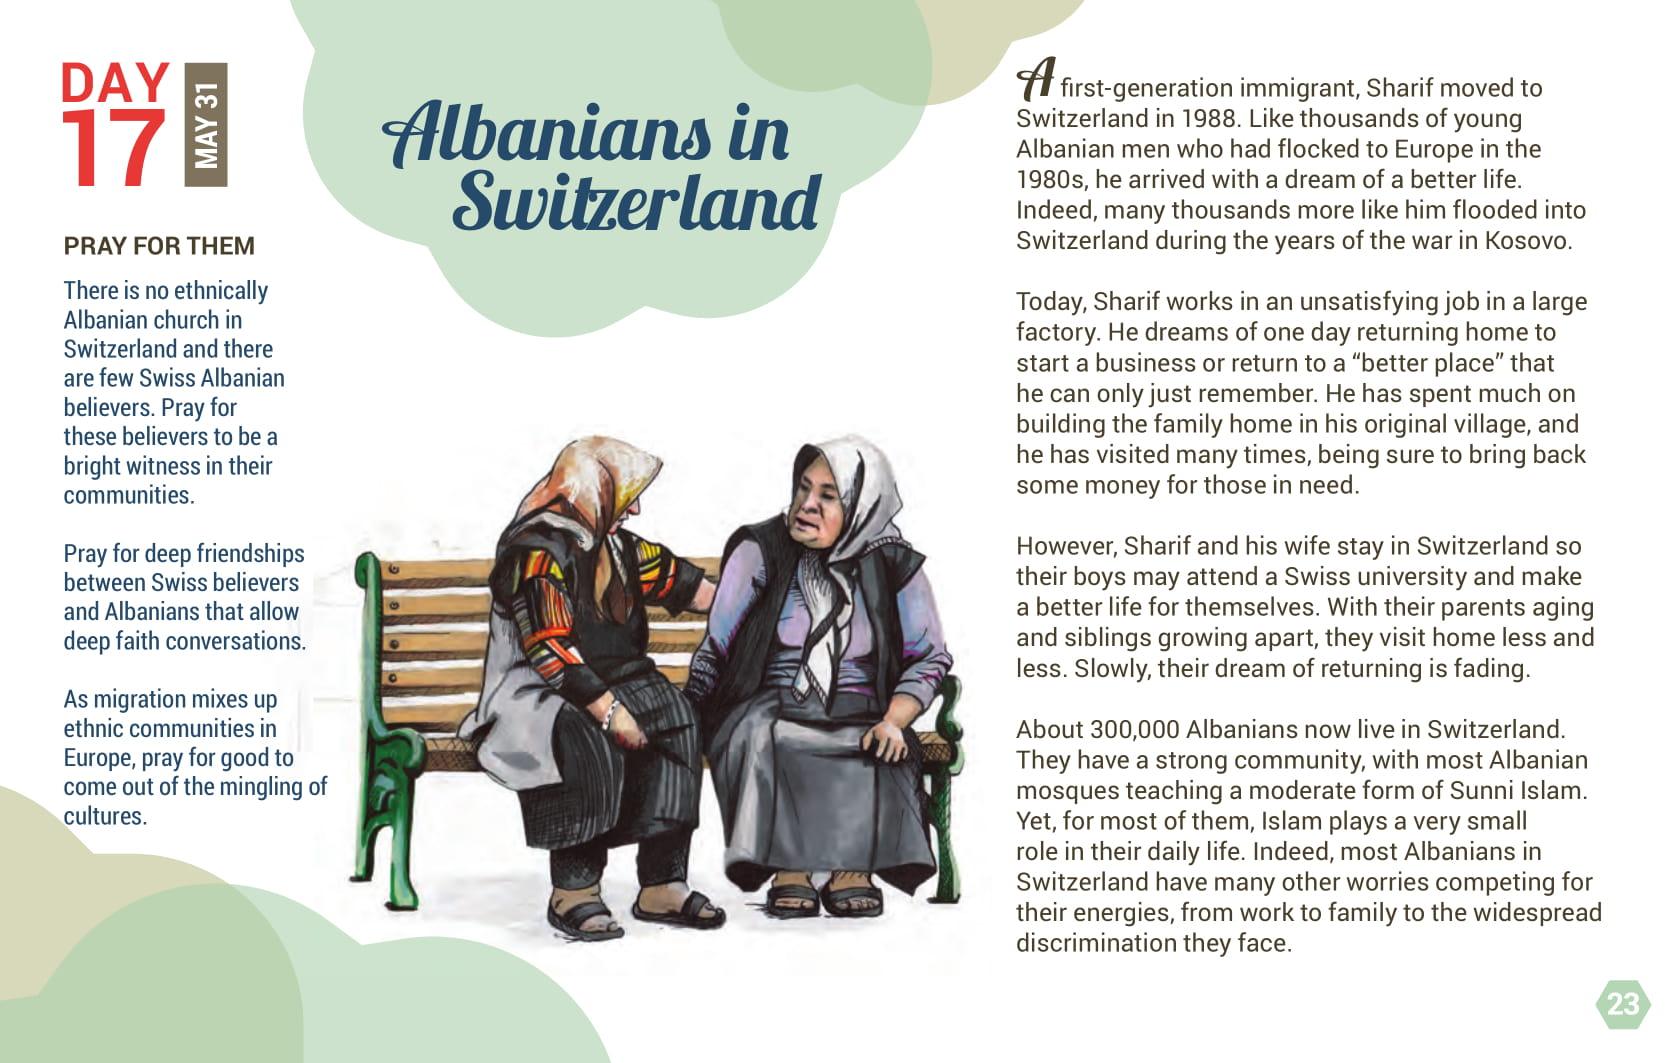 Day 17 - Albanians in Switzerland